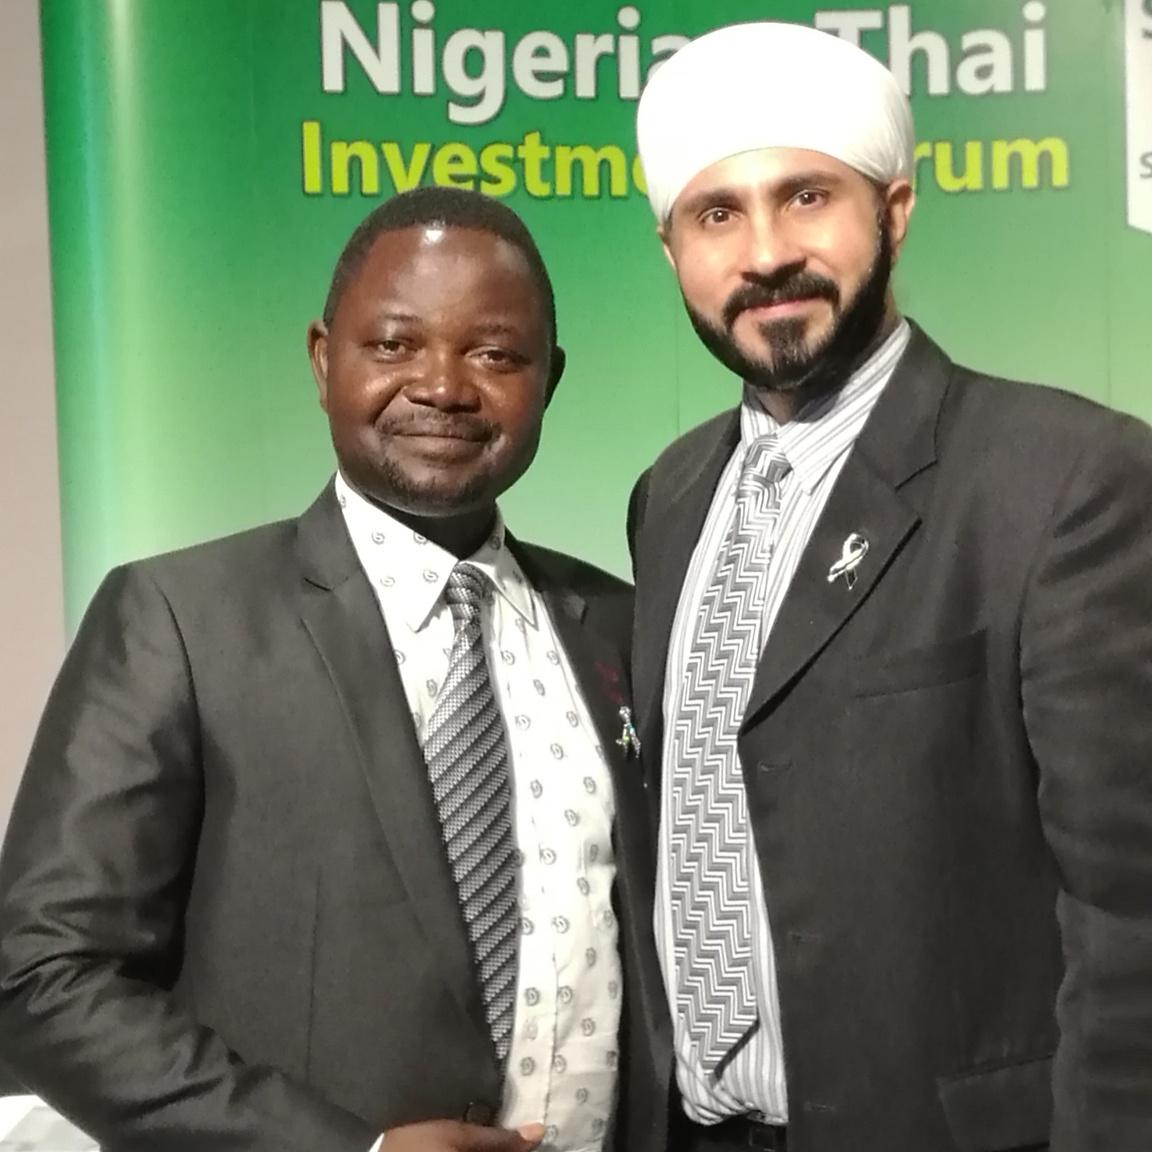 with H.E. Irmiya J. Jelison, Finance Attachd, Embassy of Nigeria